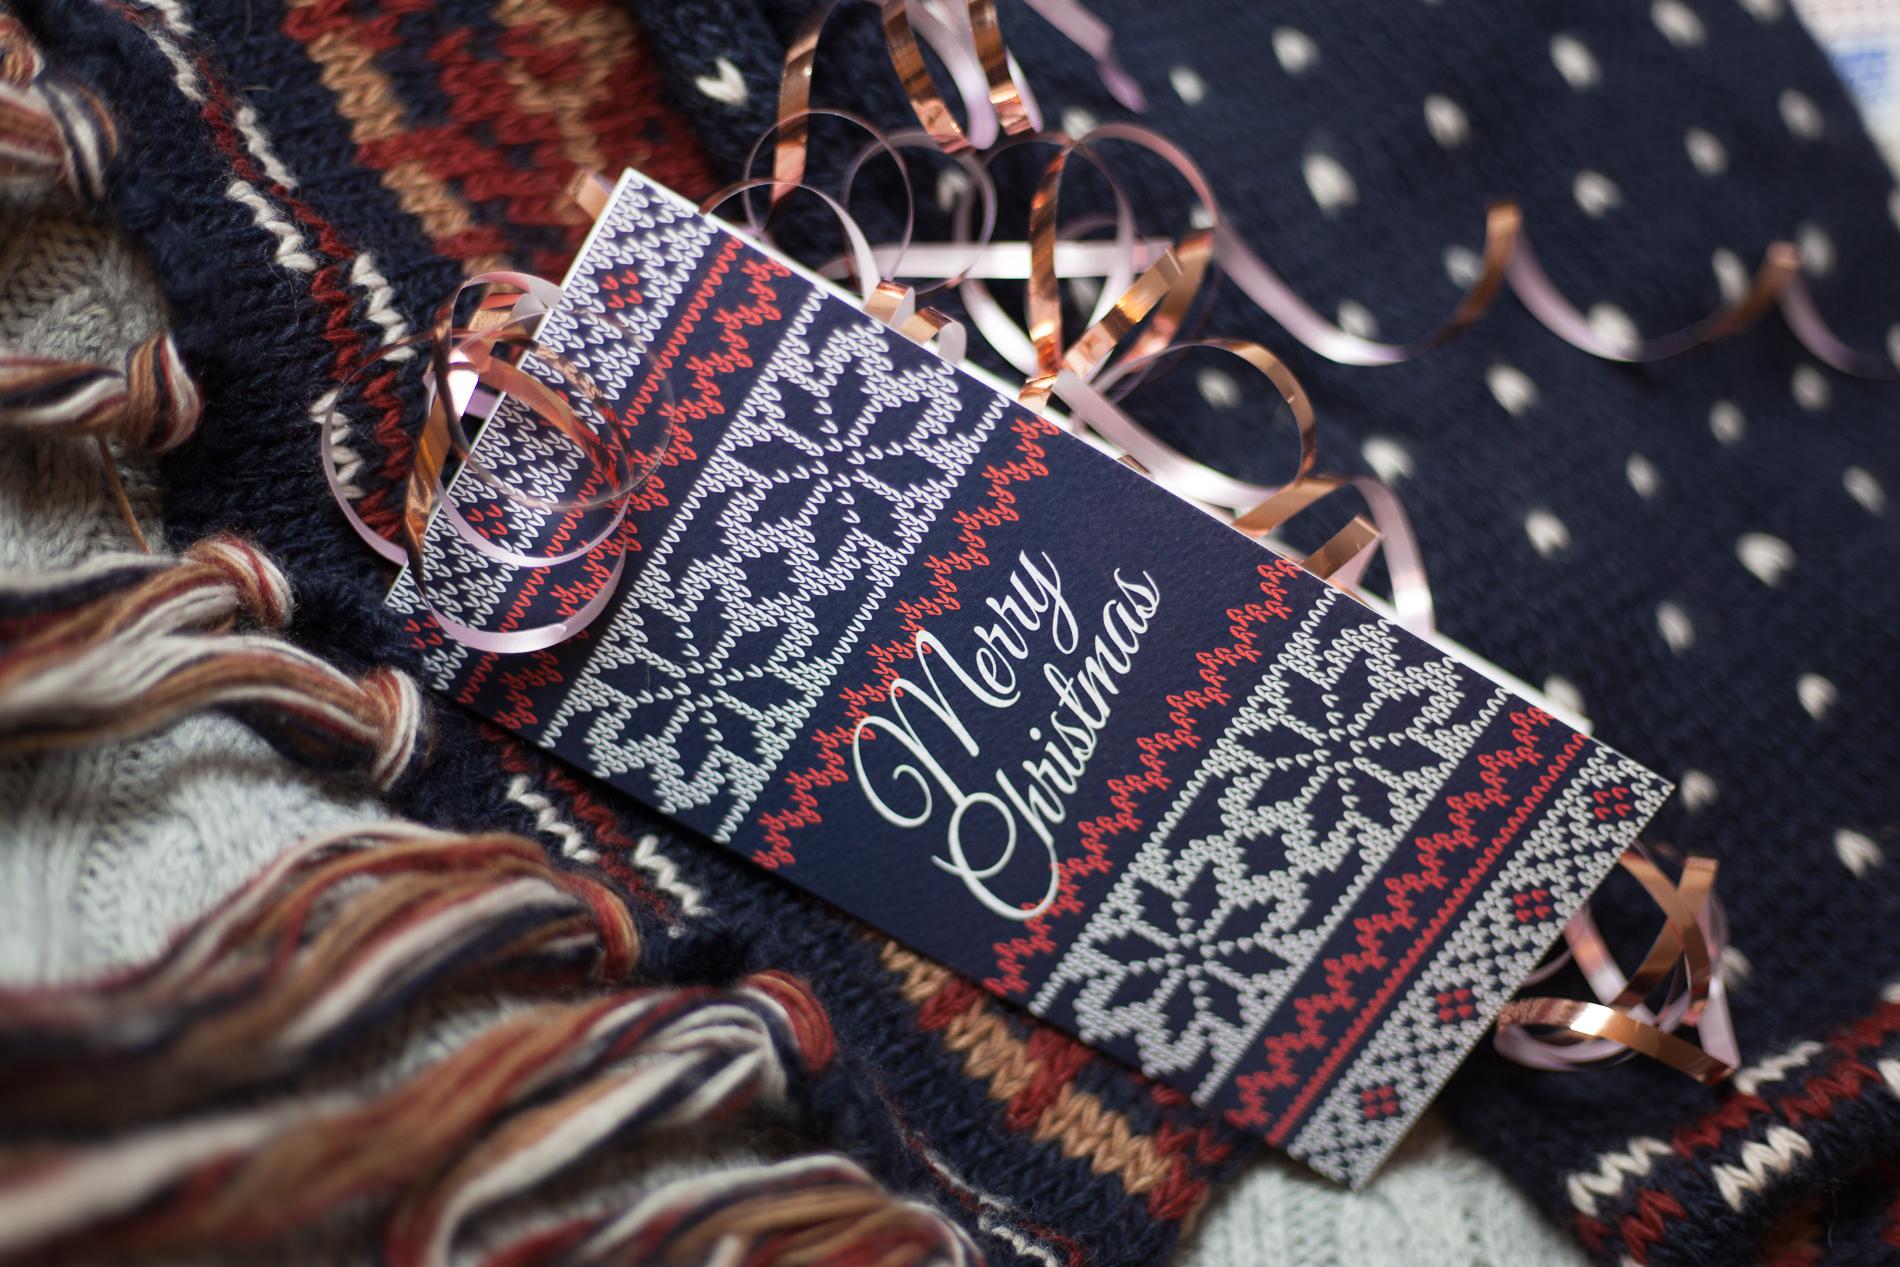 merrychristmas-card-knit2017-8.jpg